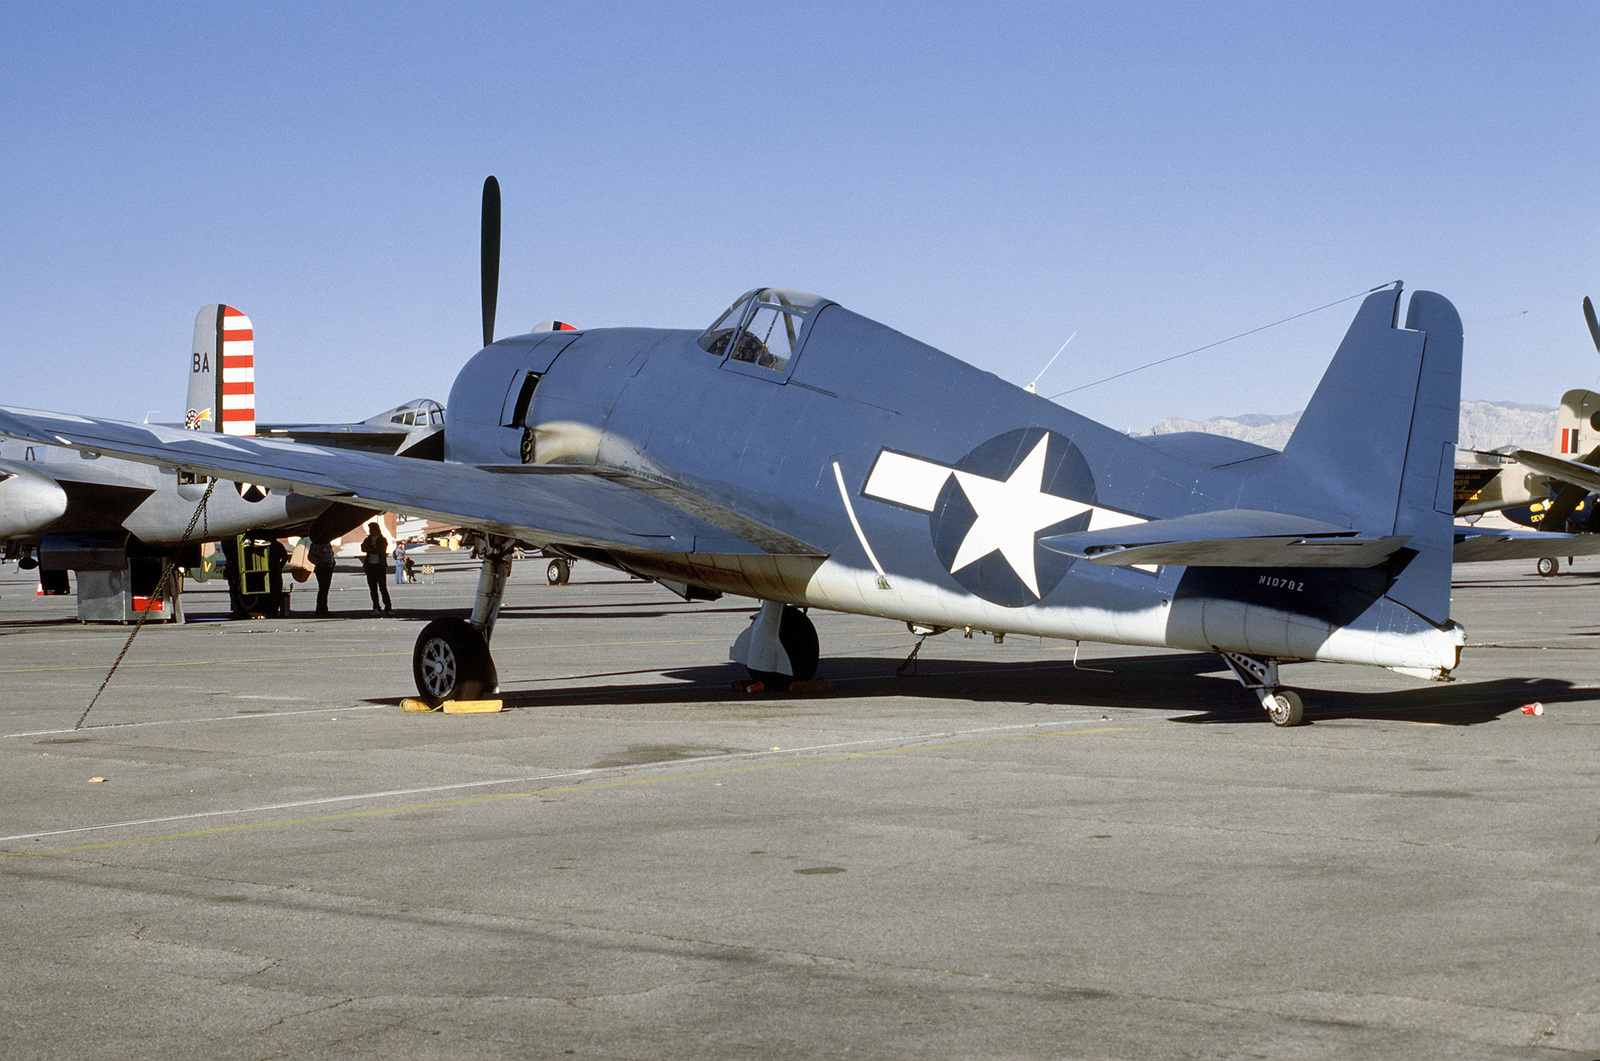 Left side view of a Grumman built F6F